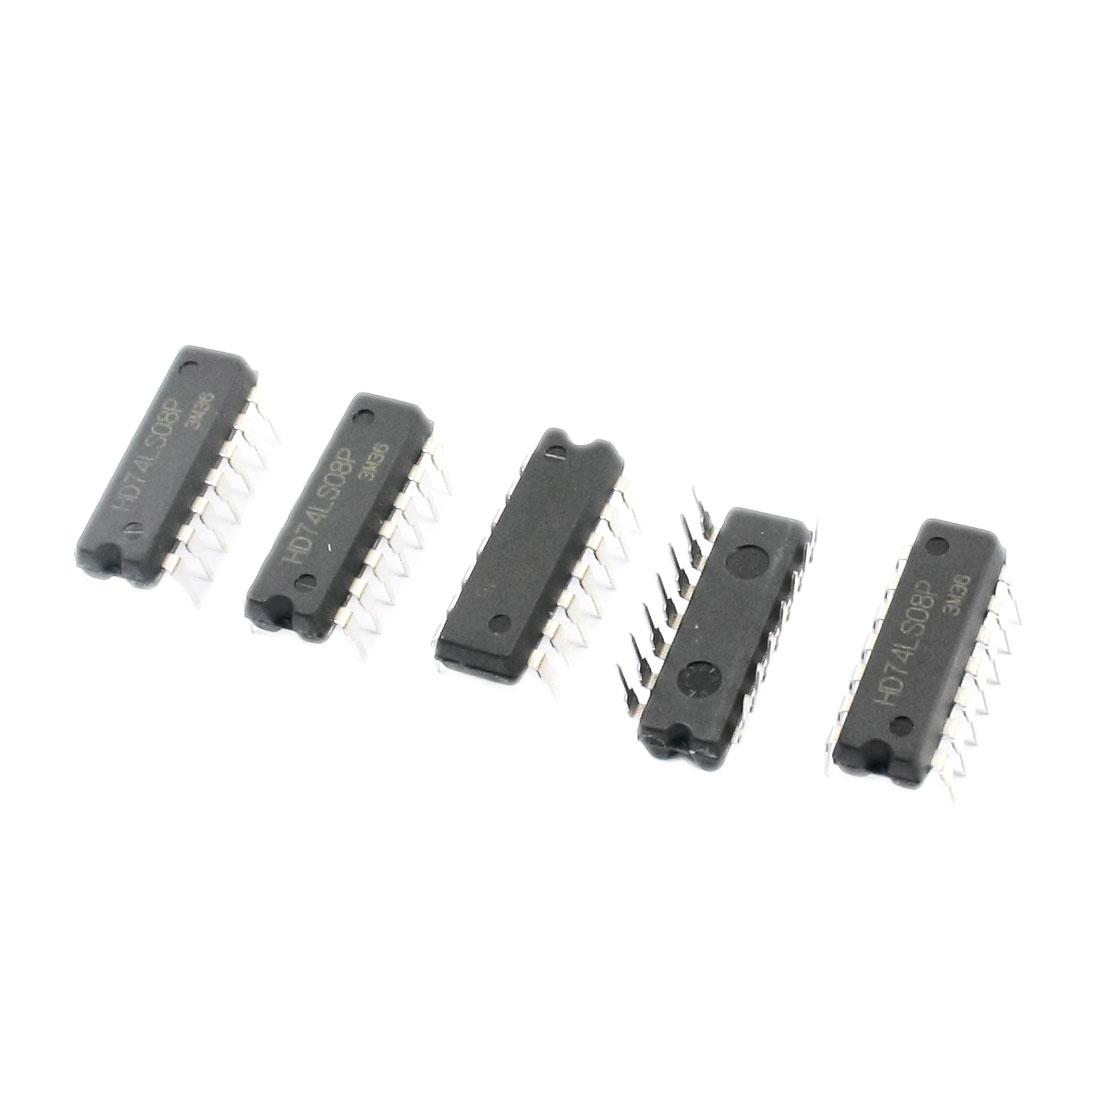 5Pcs 74LS08 DIP 14 Pins Quadruple 2-Input Positive AND Gates Semiconductor